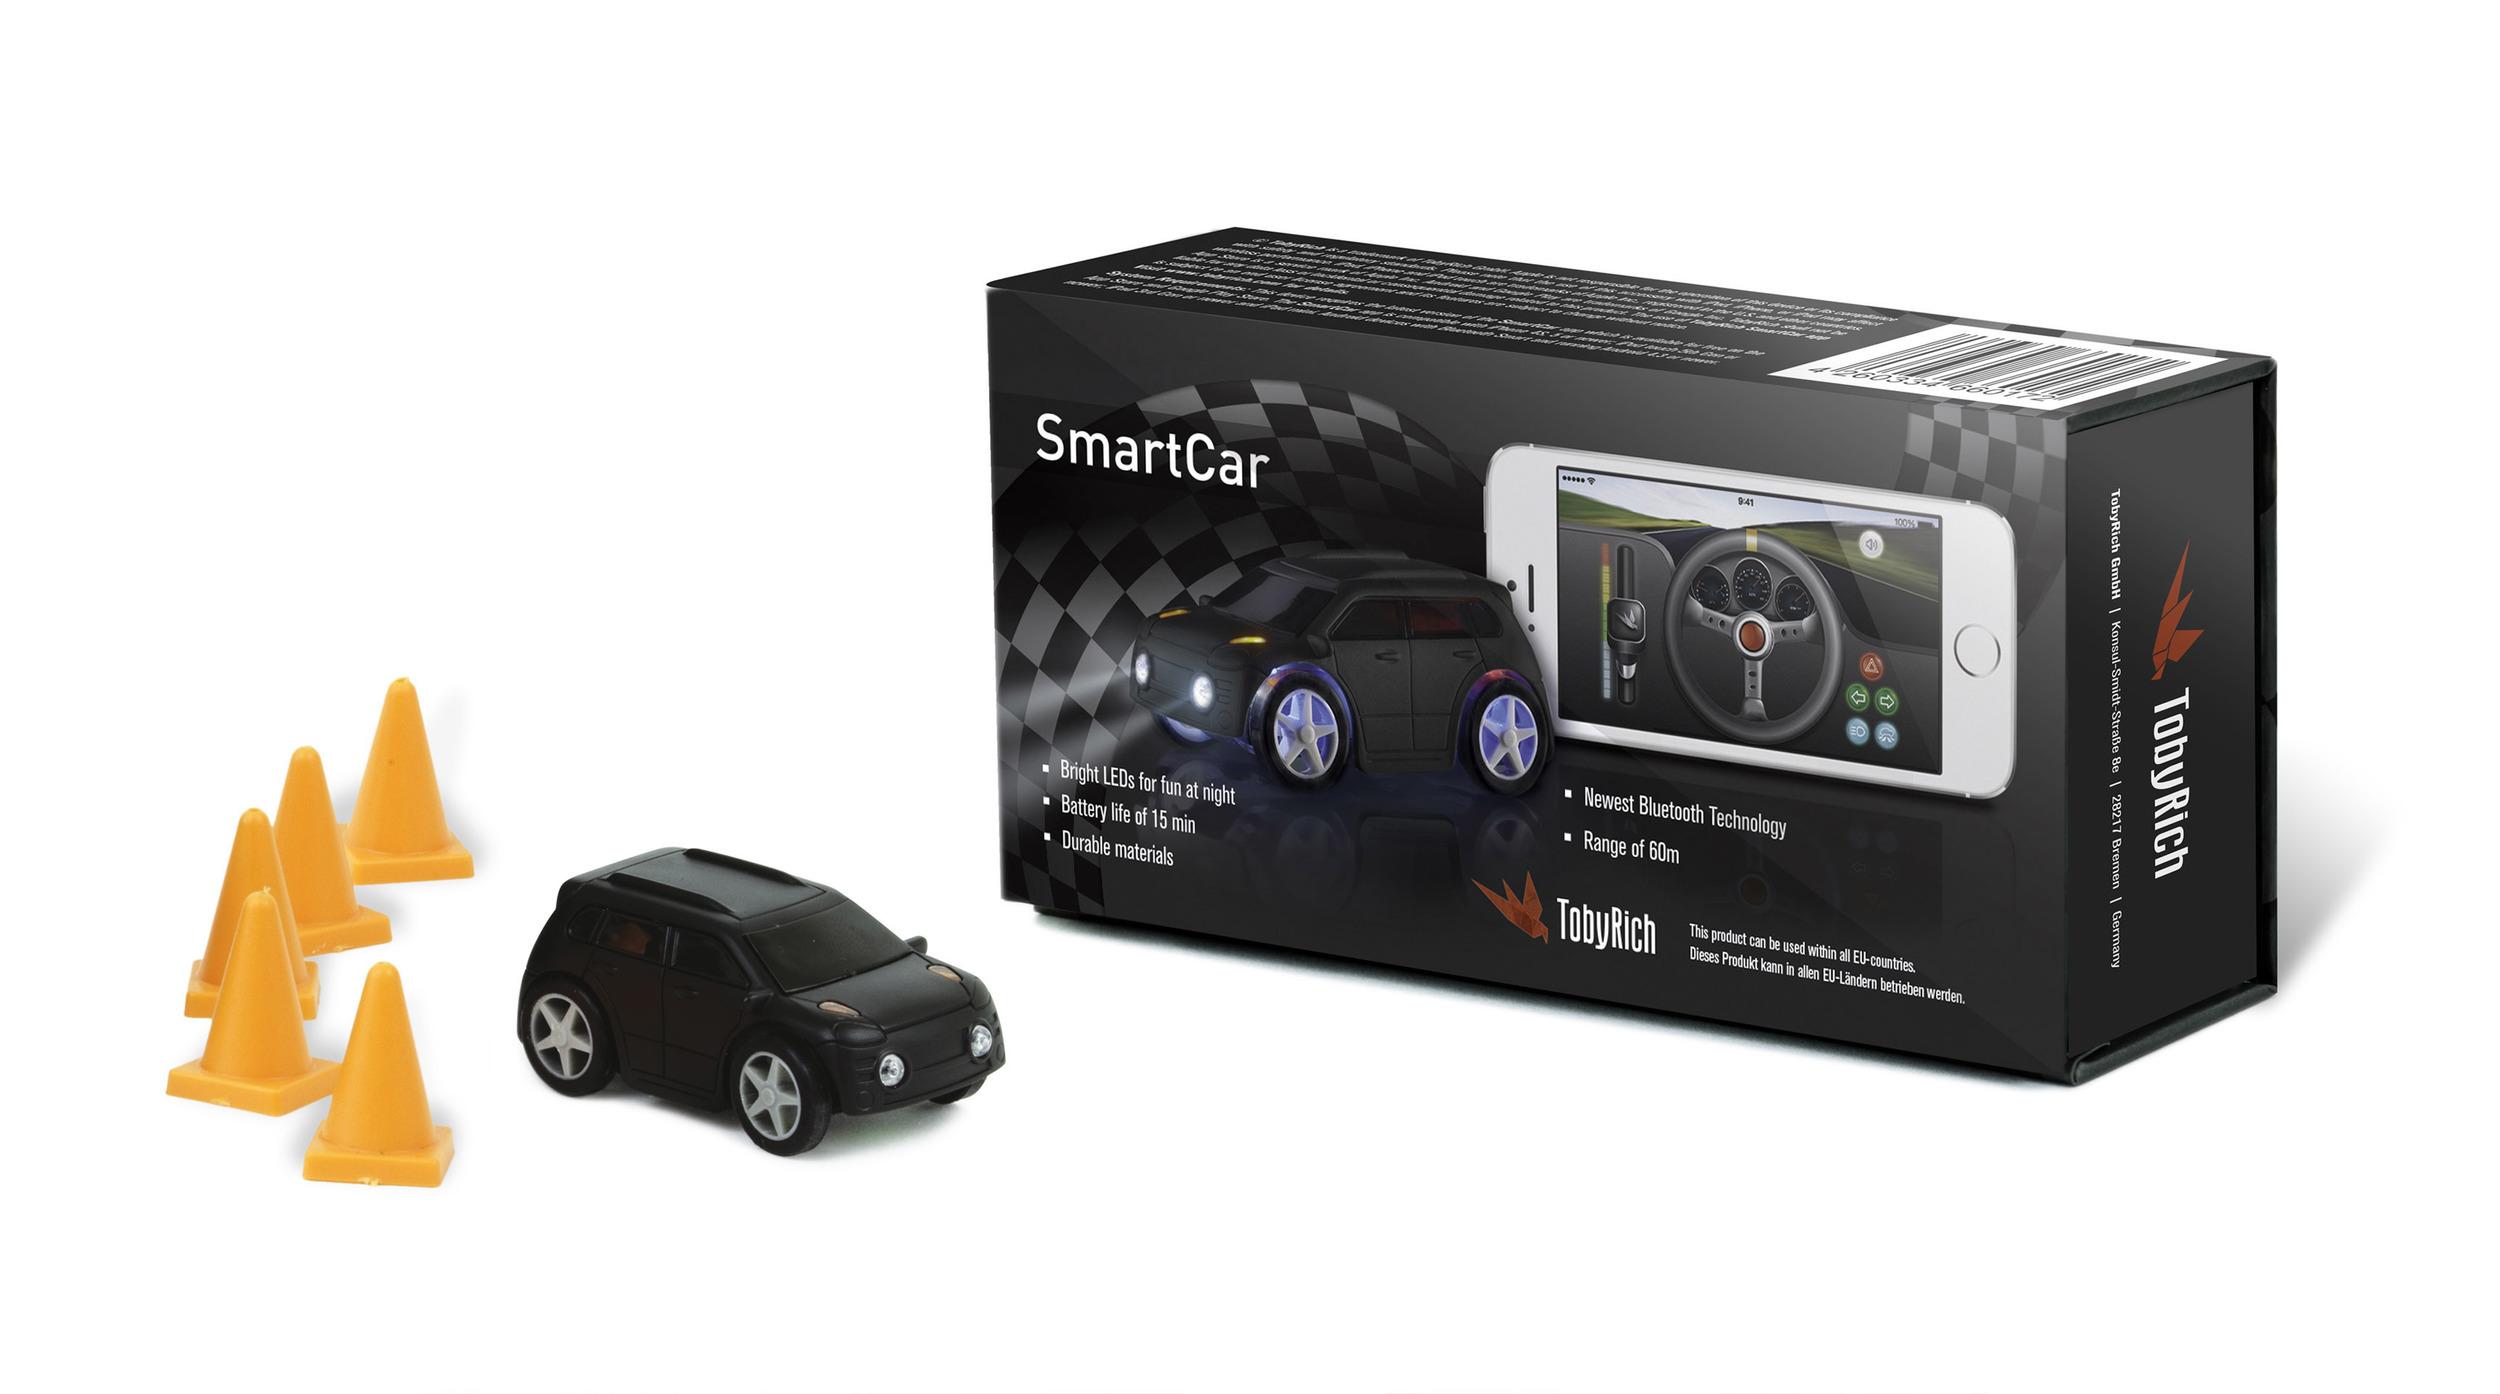 smartcar_app_mockup1.jpg